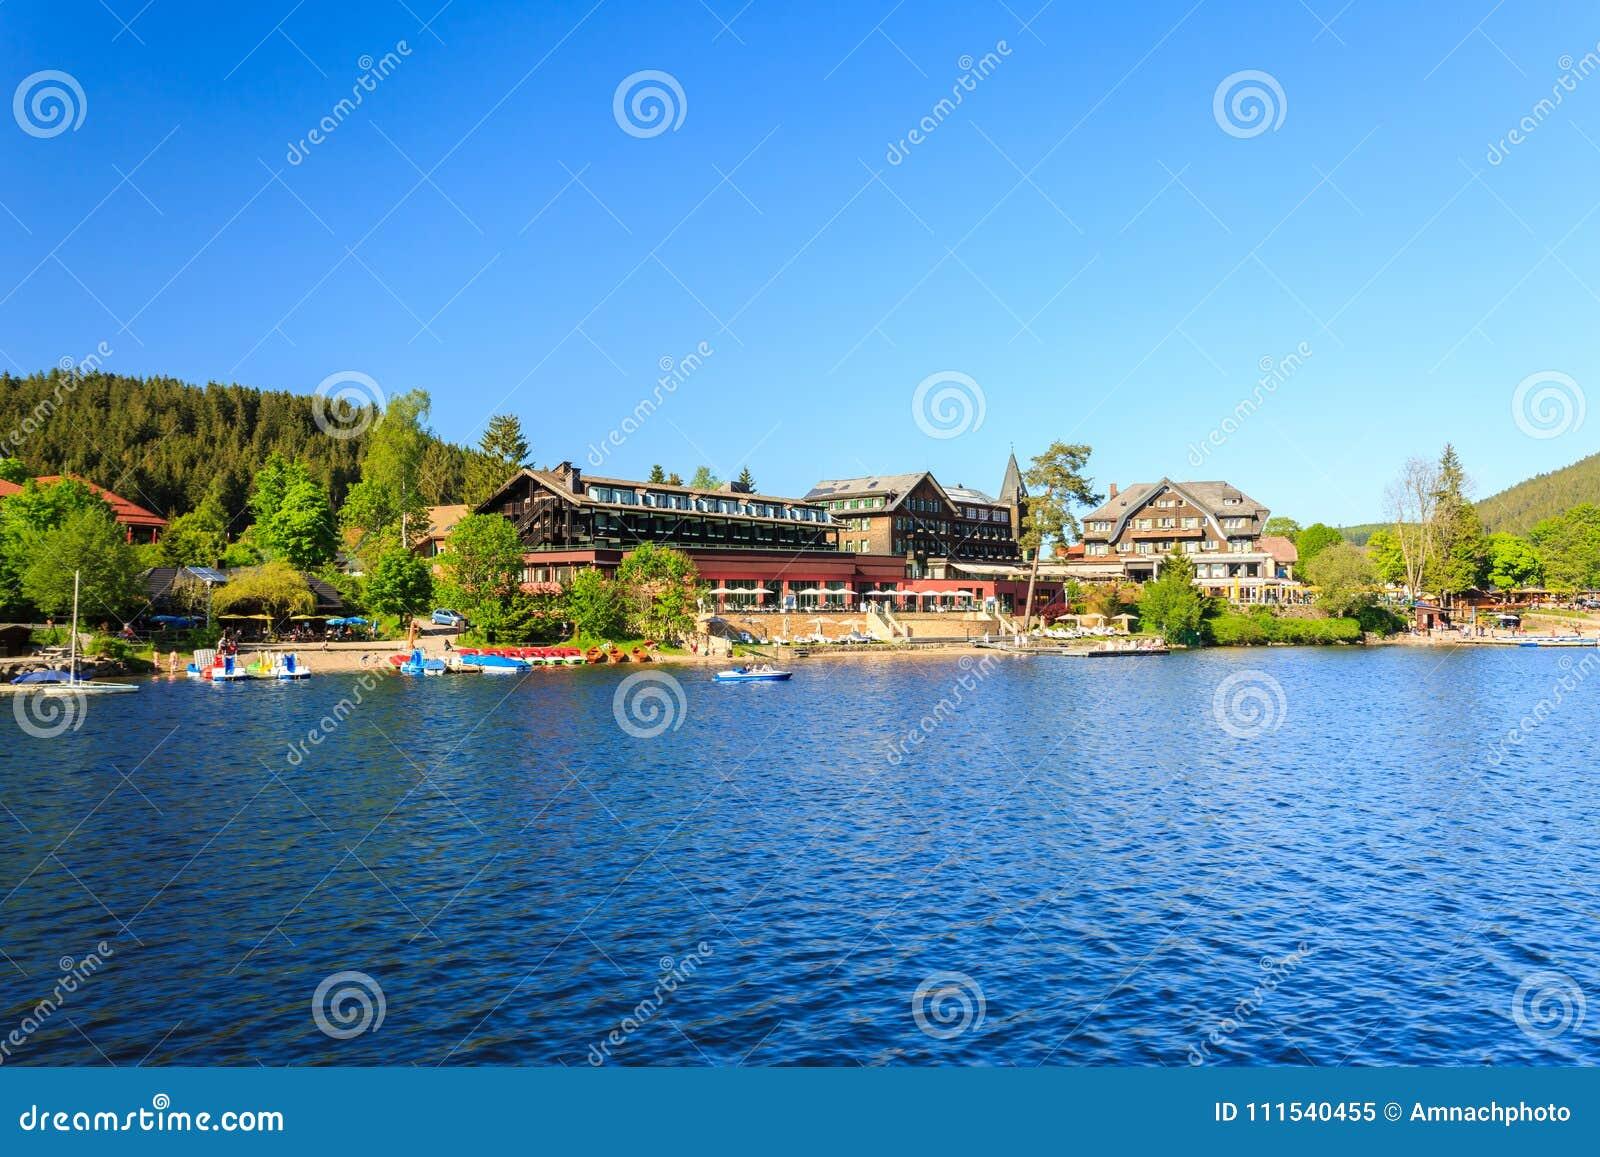 Lake Titisee Neustadt In The Black Forest Stock Image Image Of Neustadt Lake 111540455